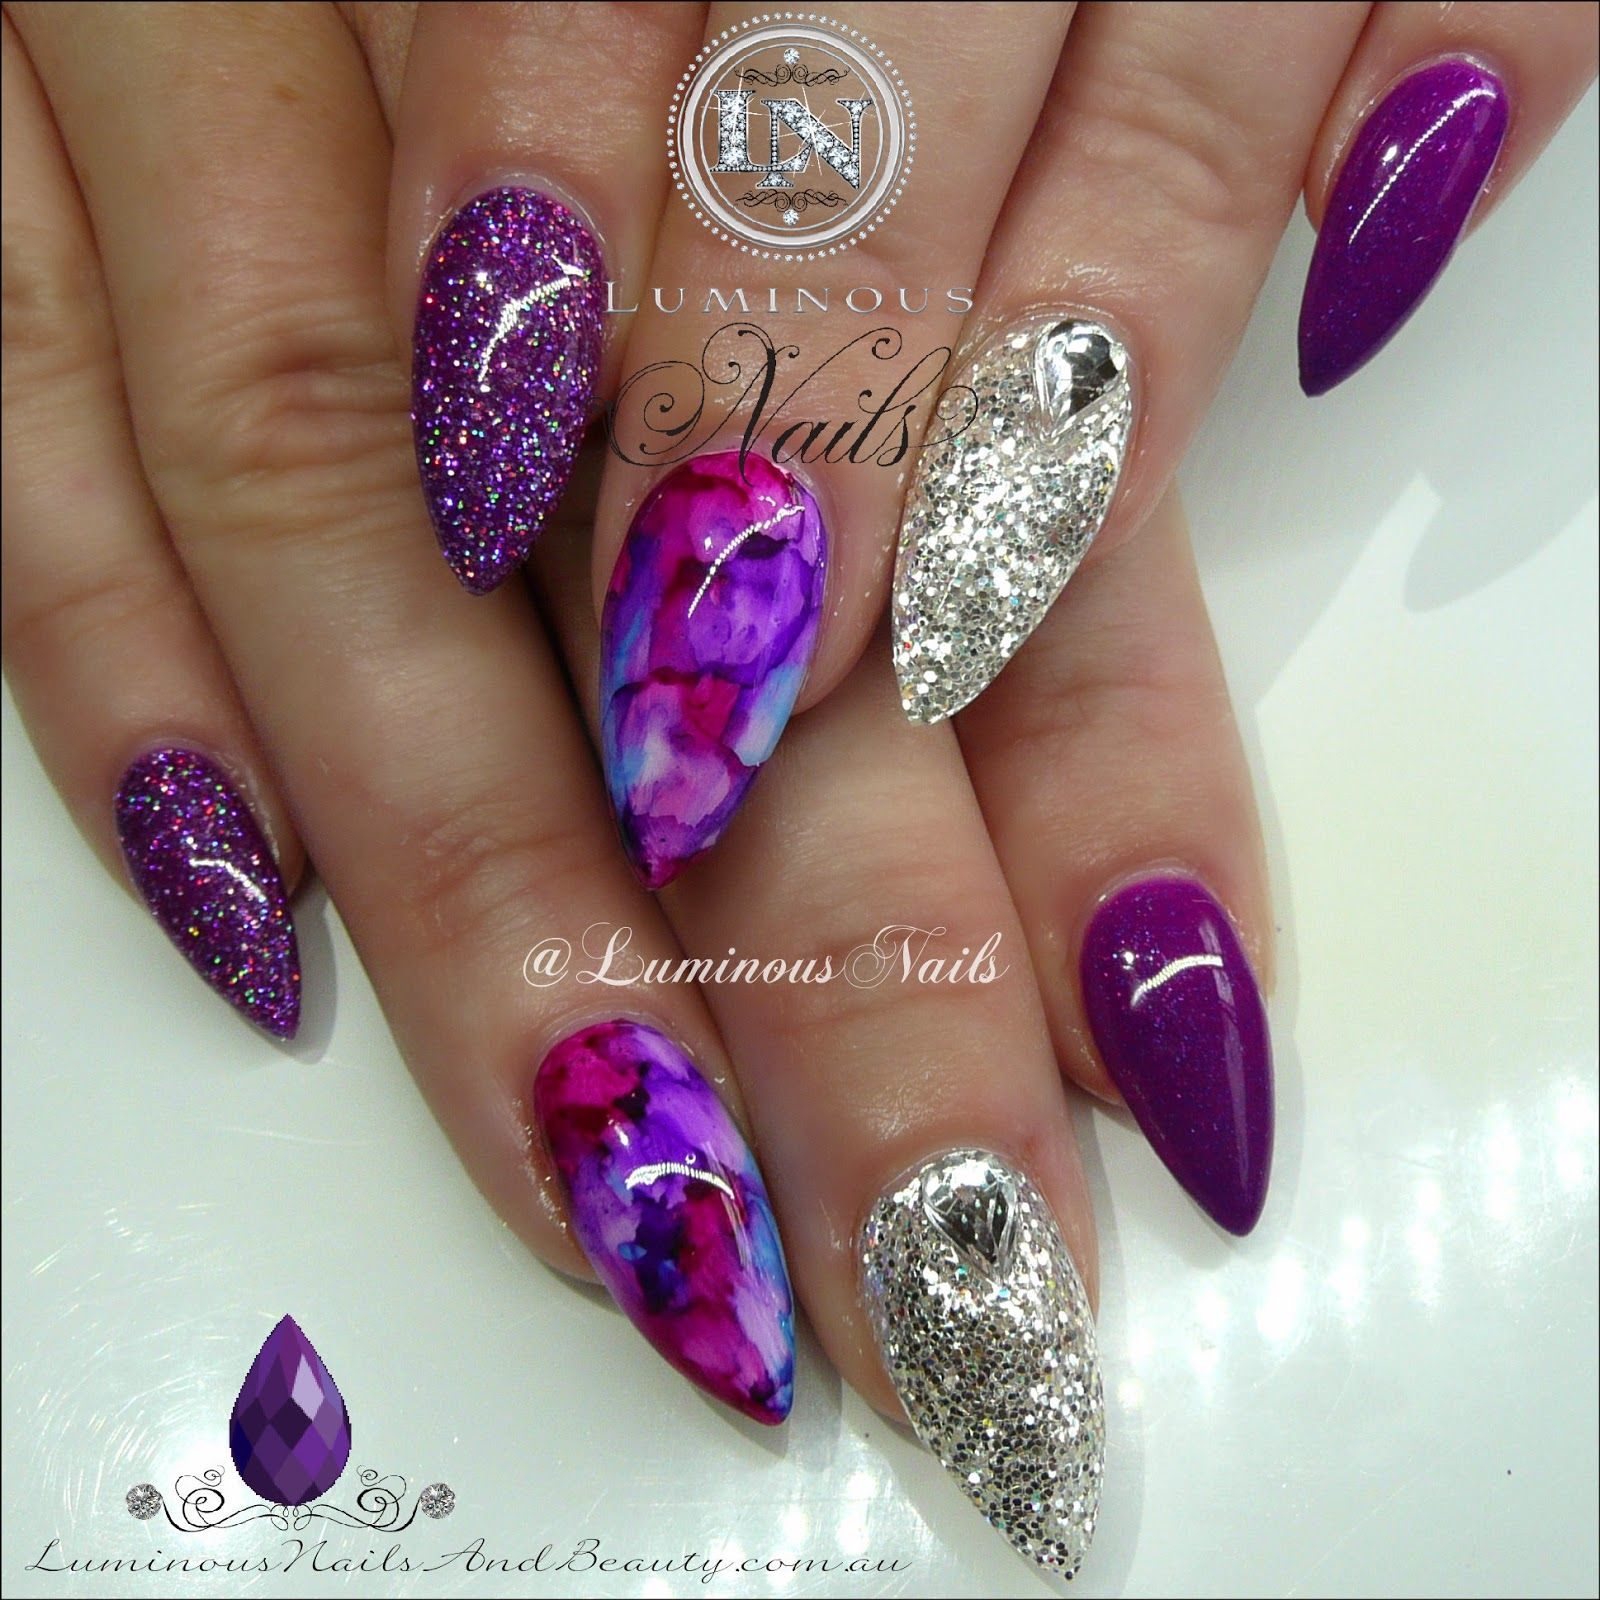 luminous nails: purple & silver nails | nails | pinterest